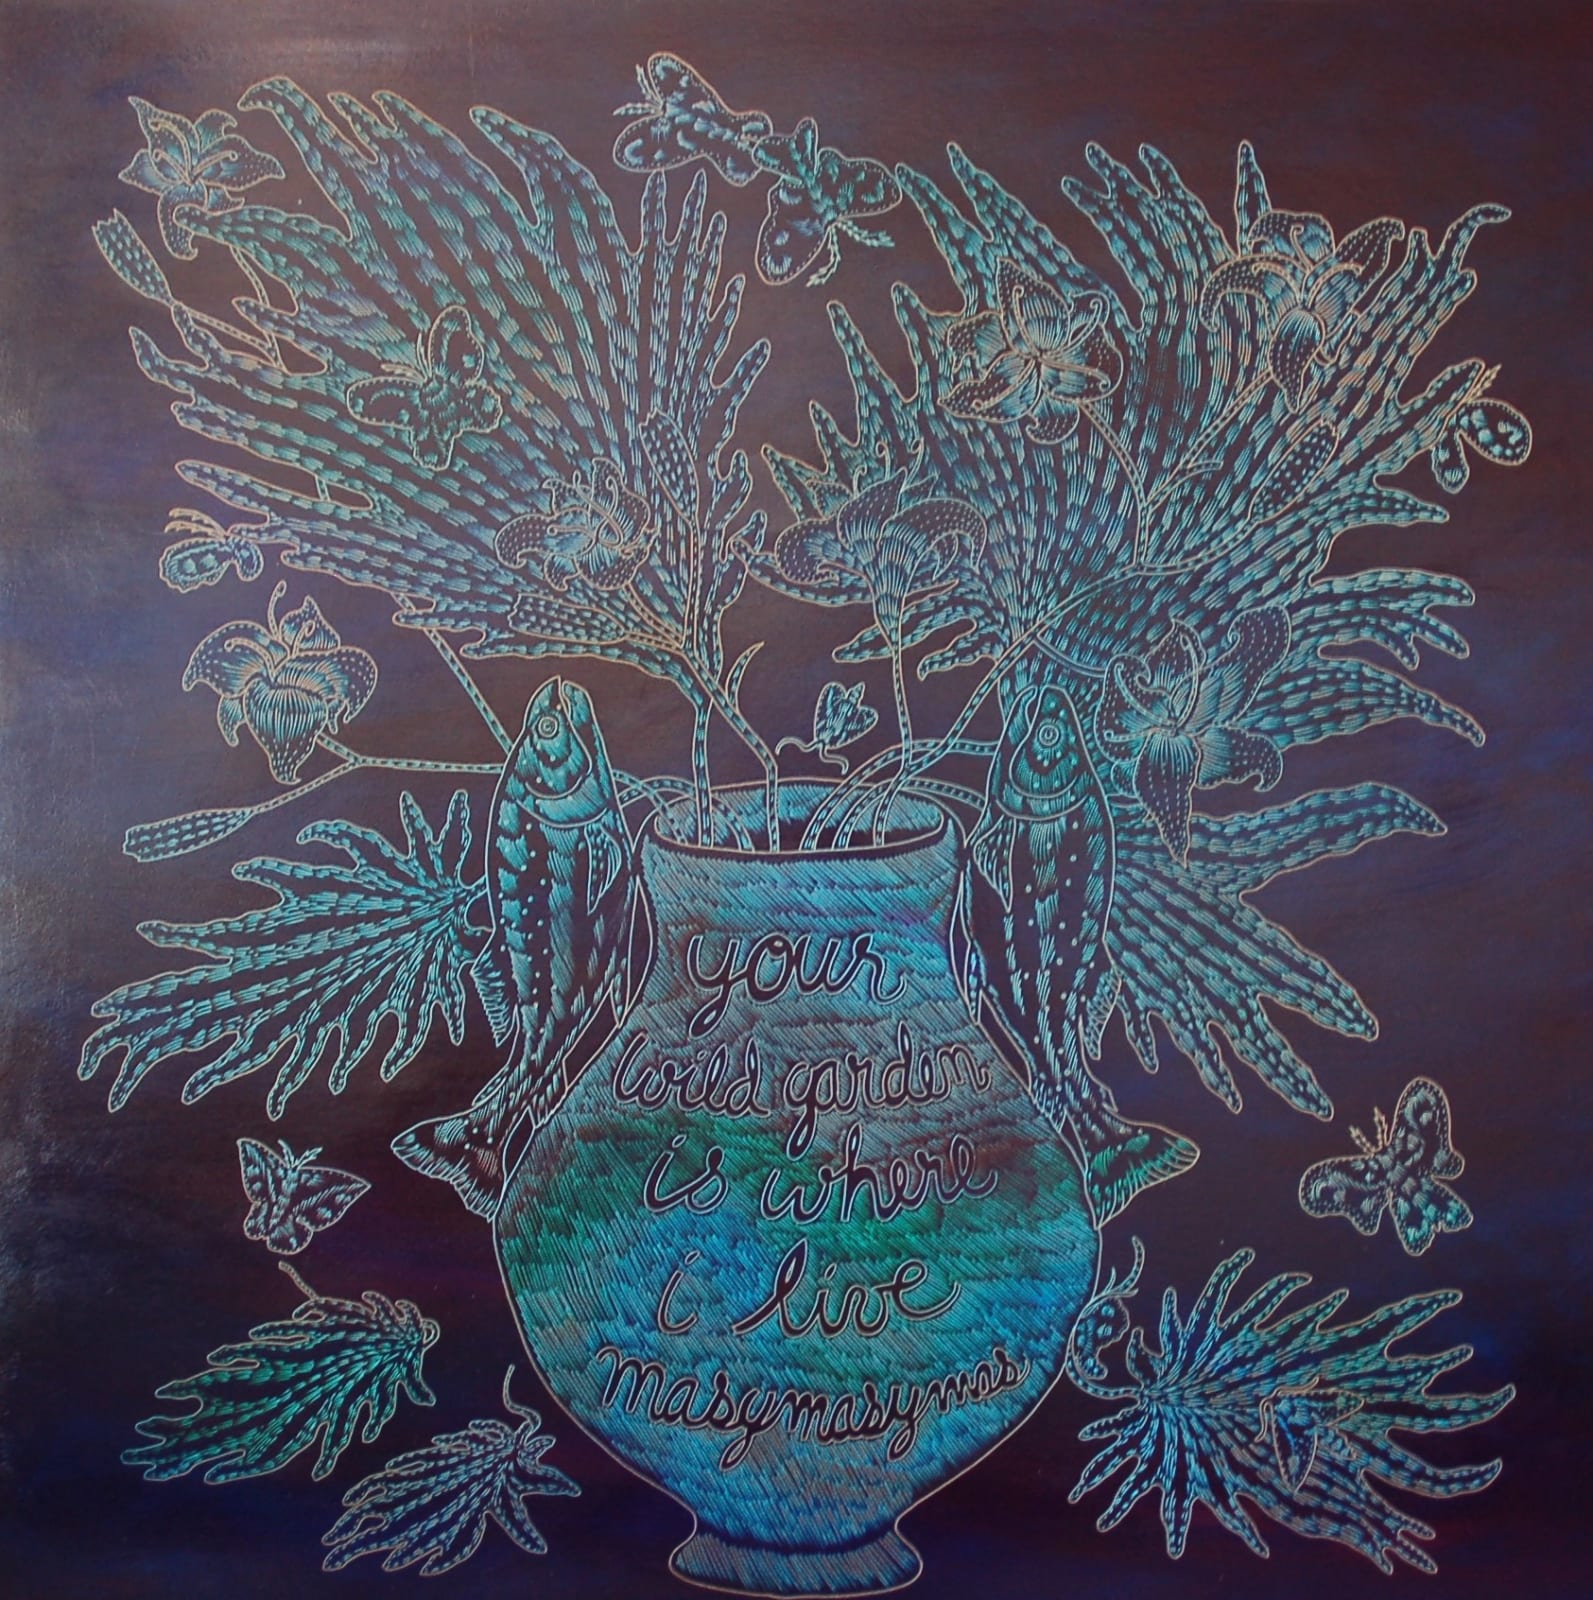 Richard Armendariz Your Wild Garden is Where I Choose to Live, 2020 Carved oil on birch panel 48 x 48